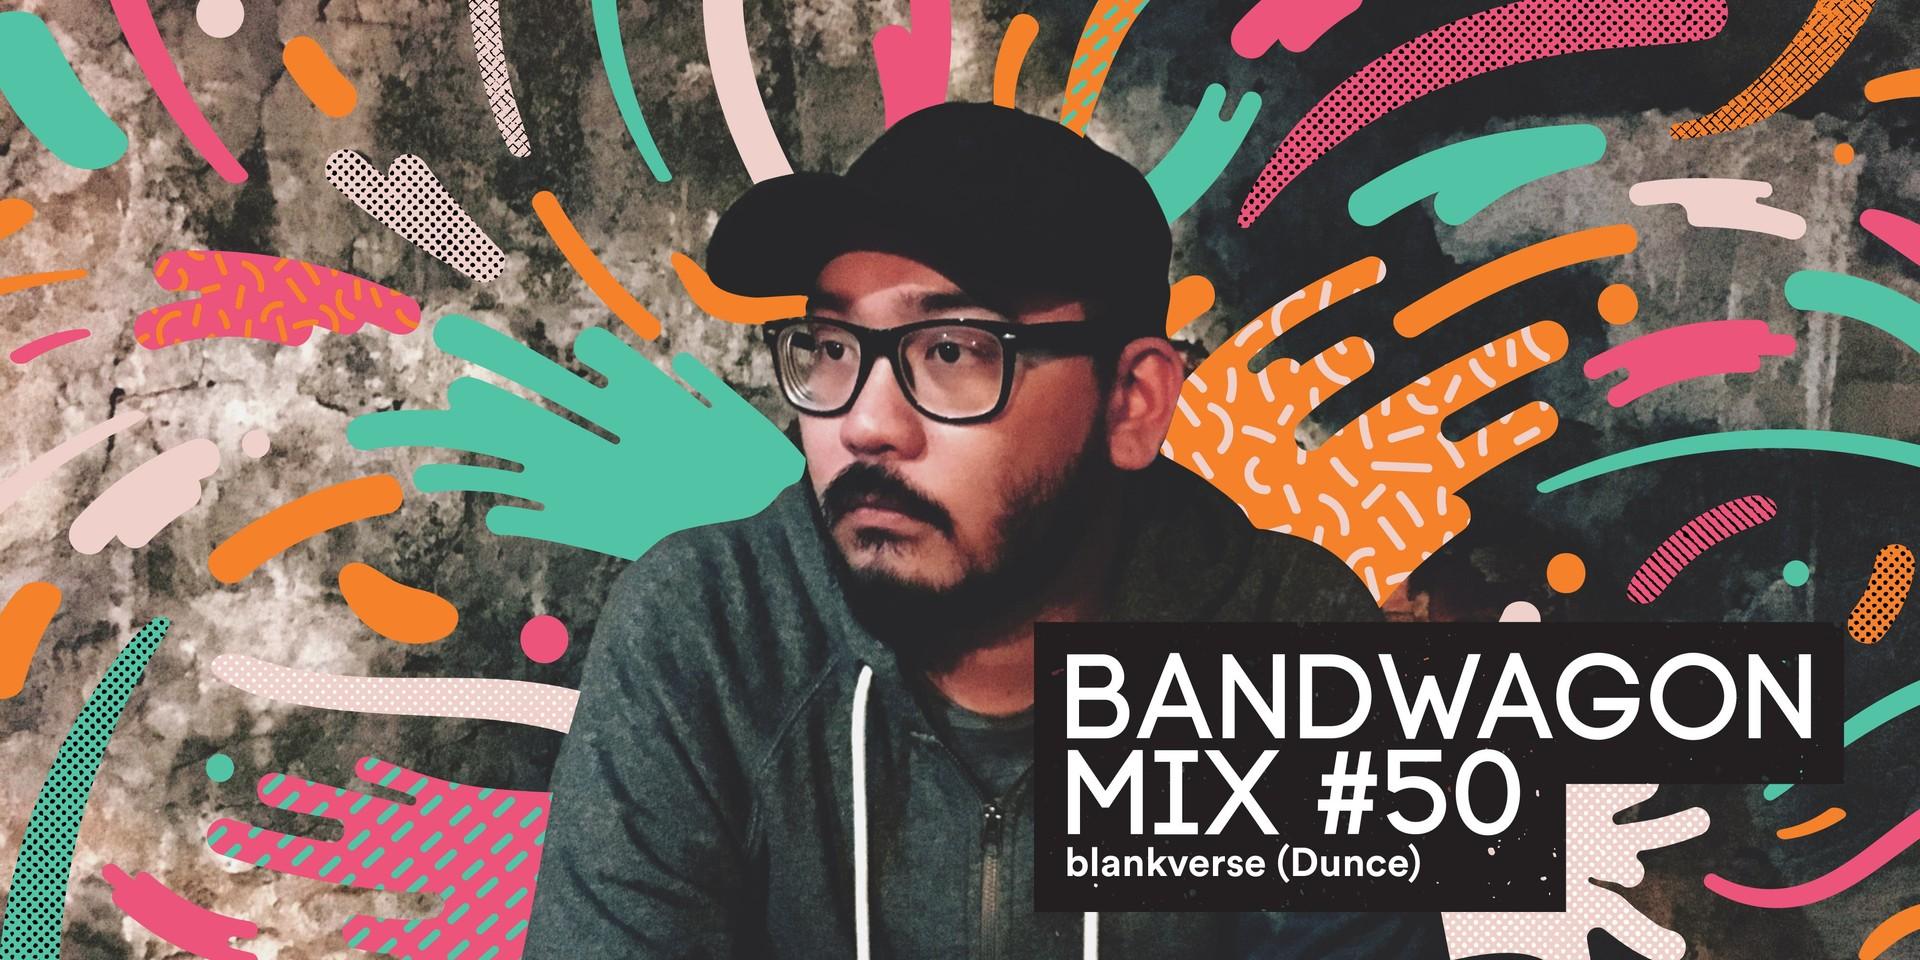 Bandwagon Mix #50: blankverse (Dunce)